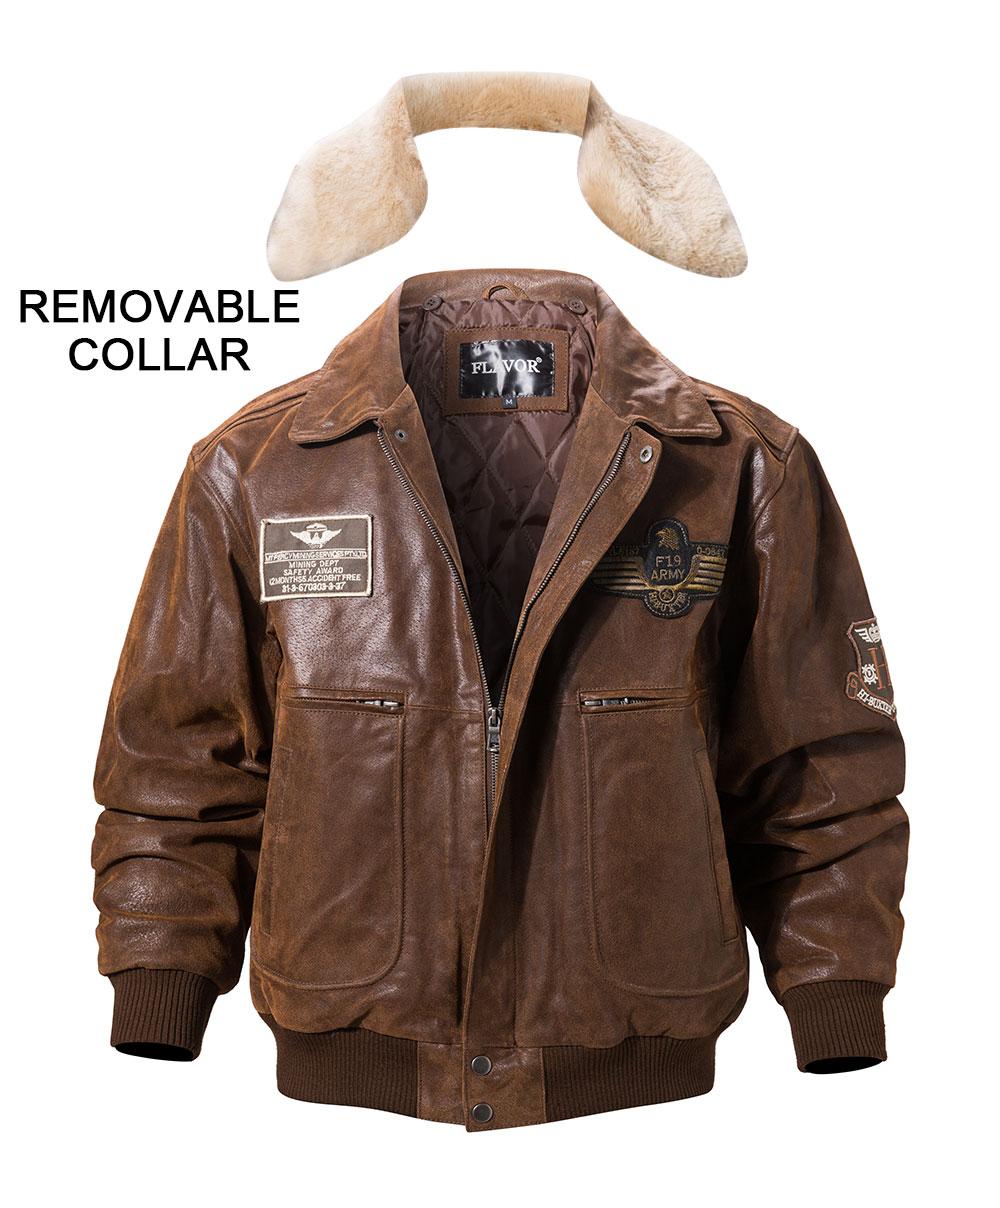 H708110538844453e936c2a4ee8a77e5bk FLAVOR New Men's Real Leather Bomber Jacket with Removable Fur Collar Genuine Leather Pigskin Jackets Winter Warm Coat Men